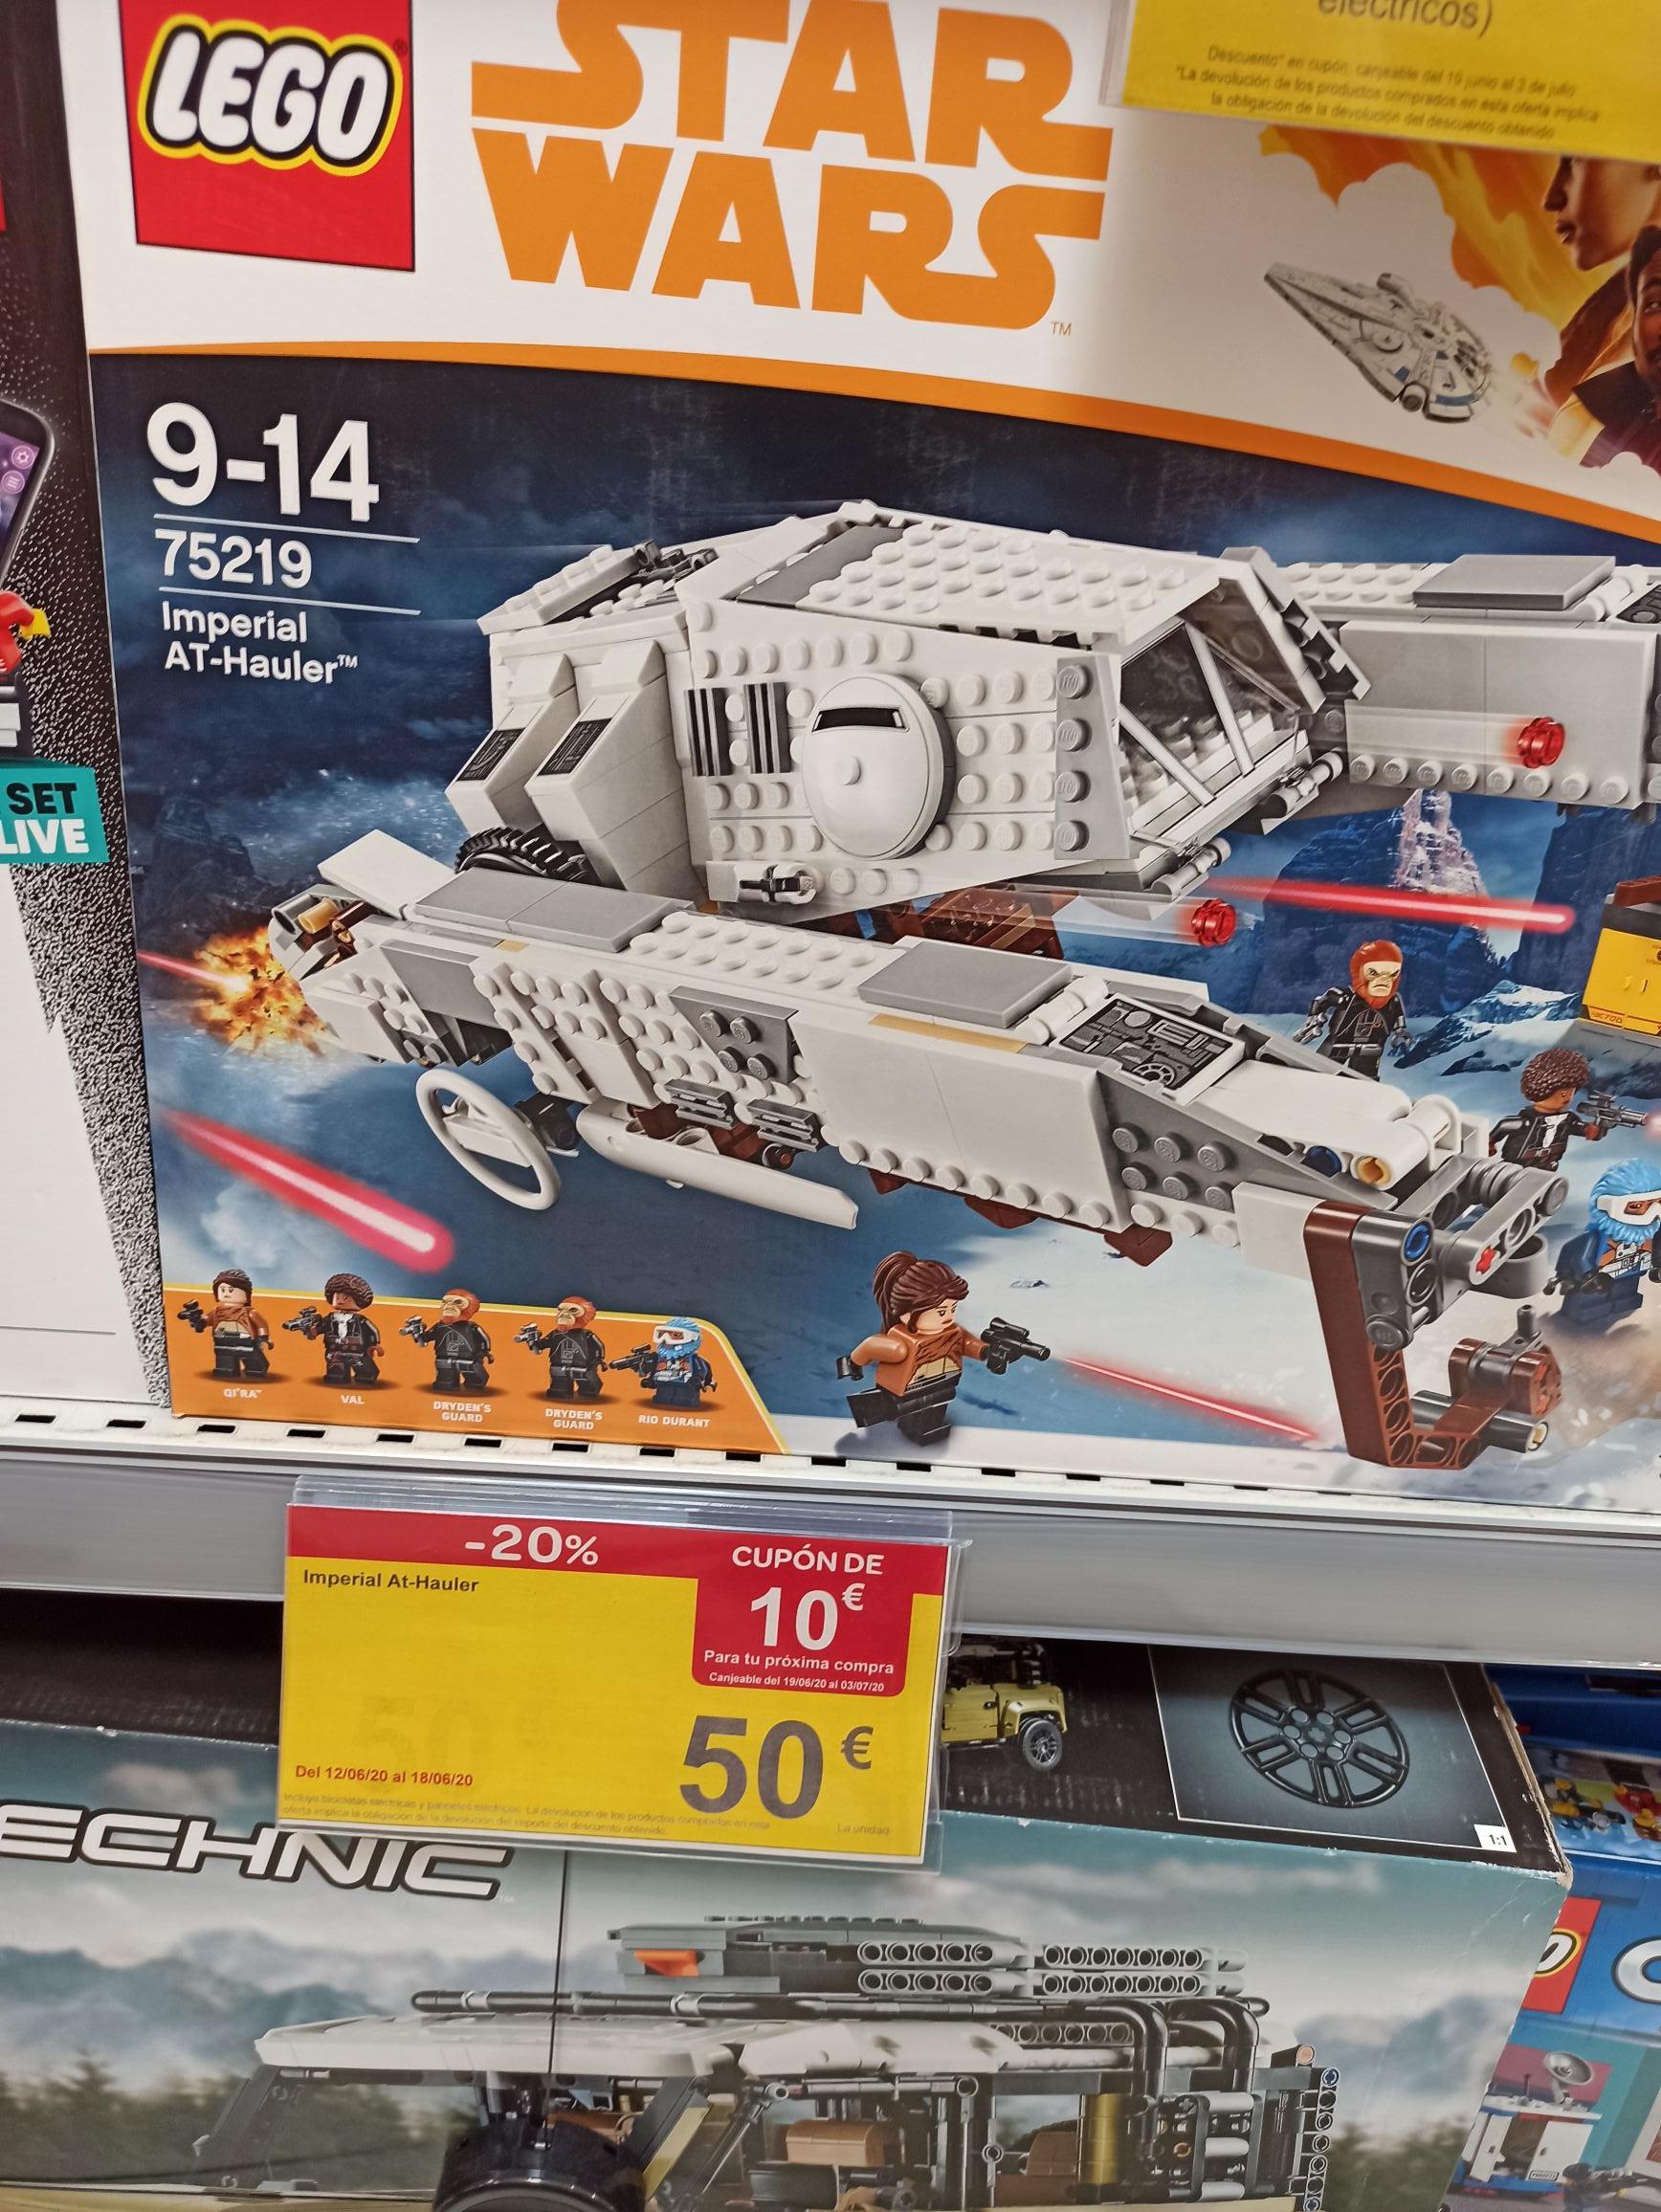 LEGO Star Wars - Imperial AT-Hauler en Carrefour de Villareal